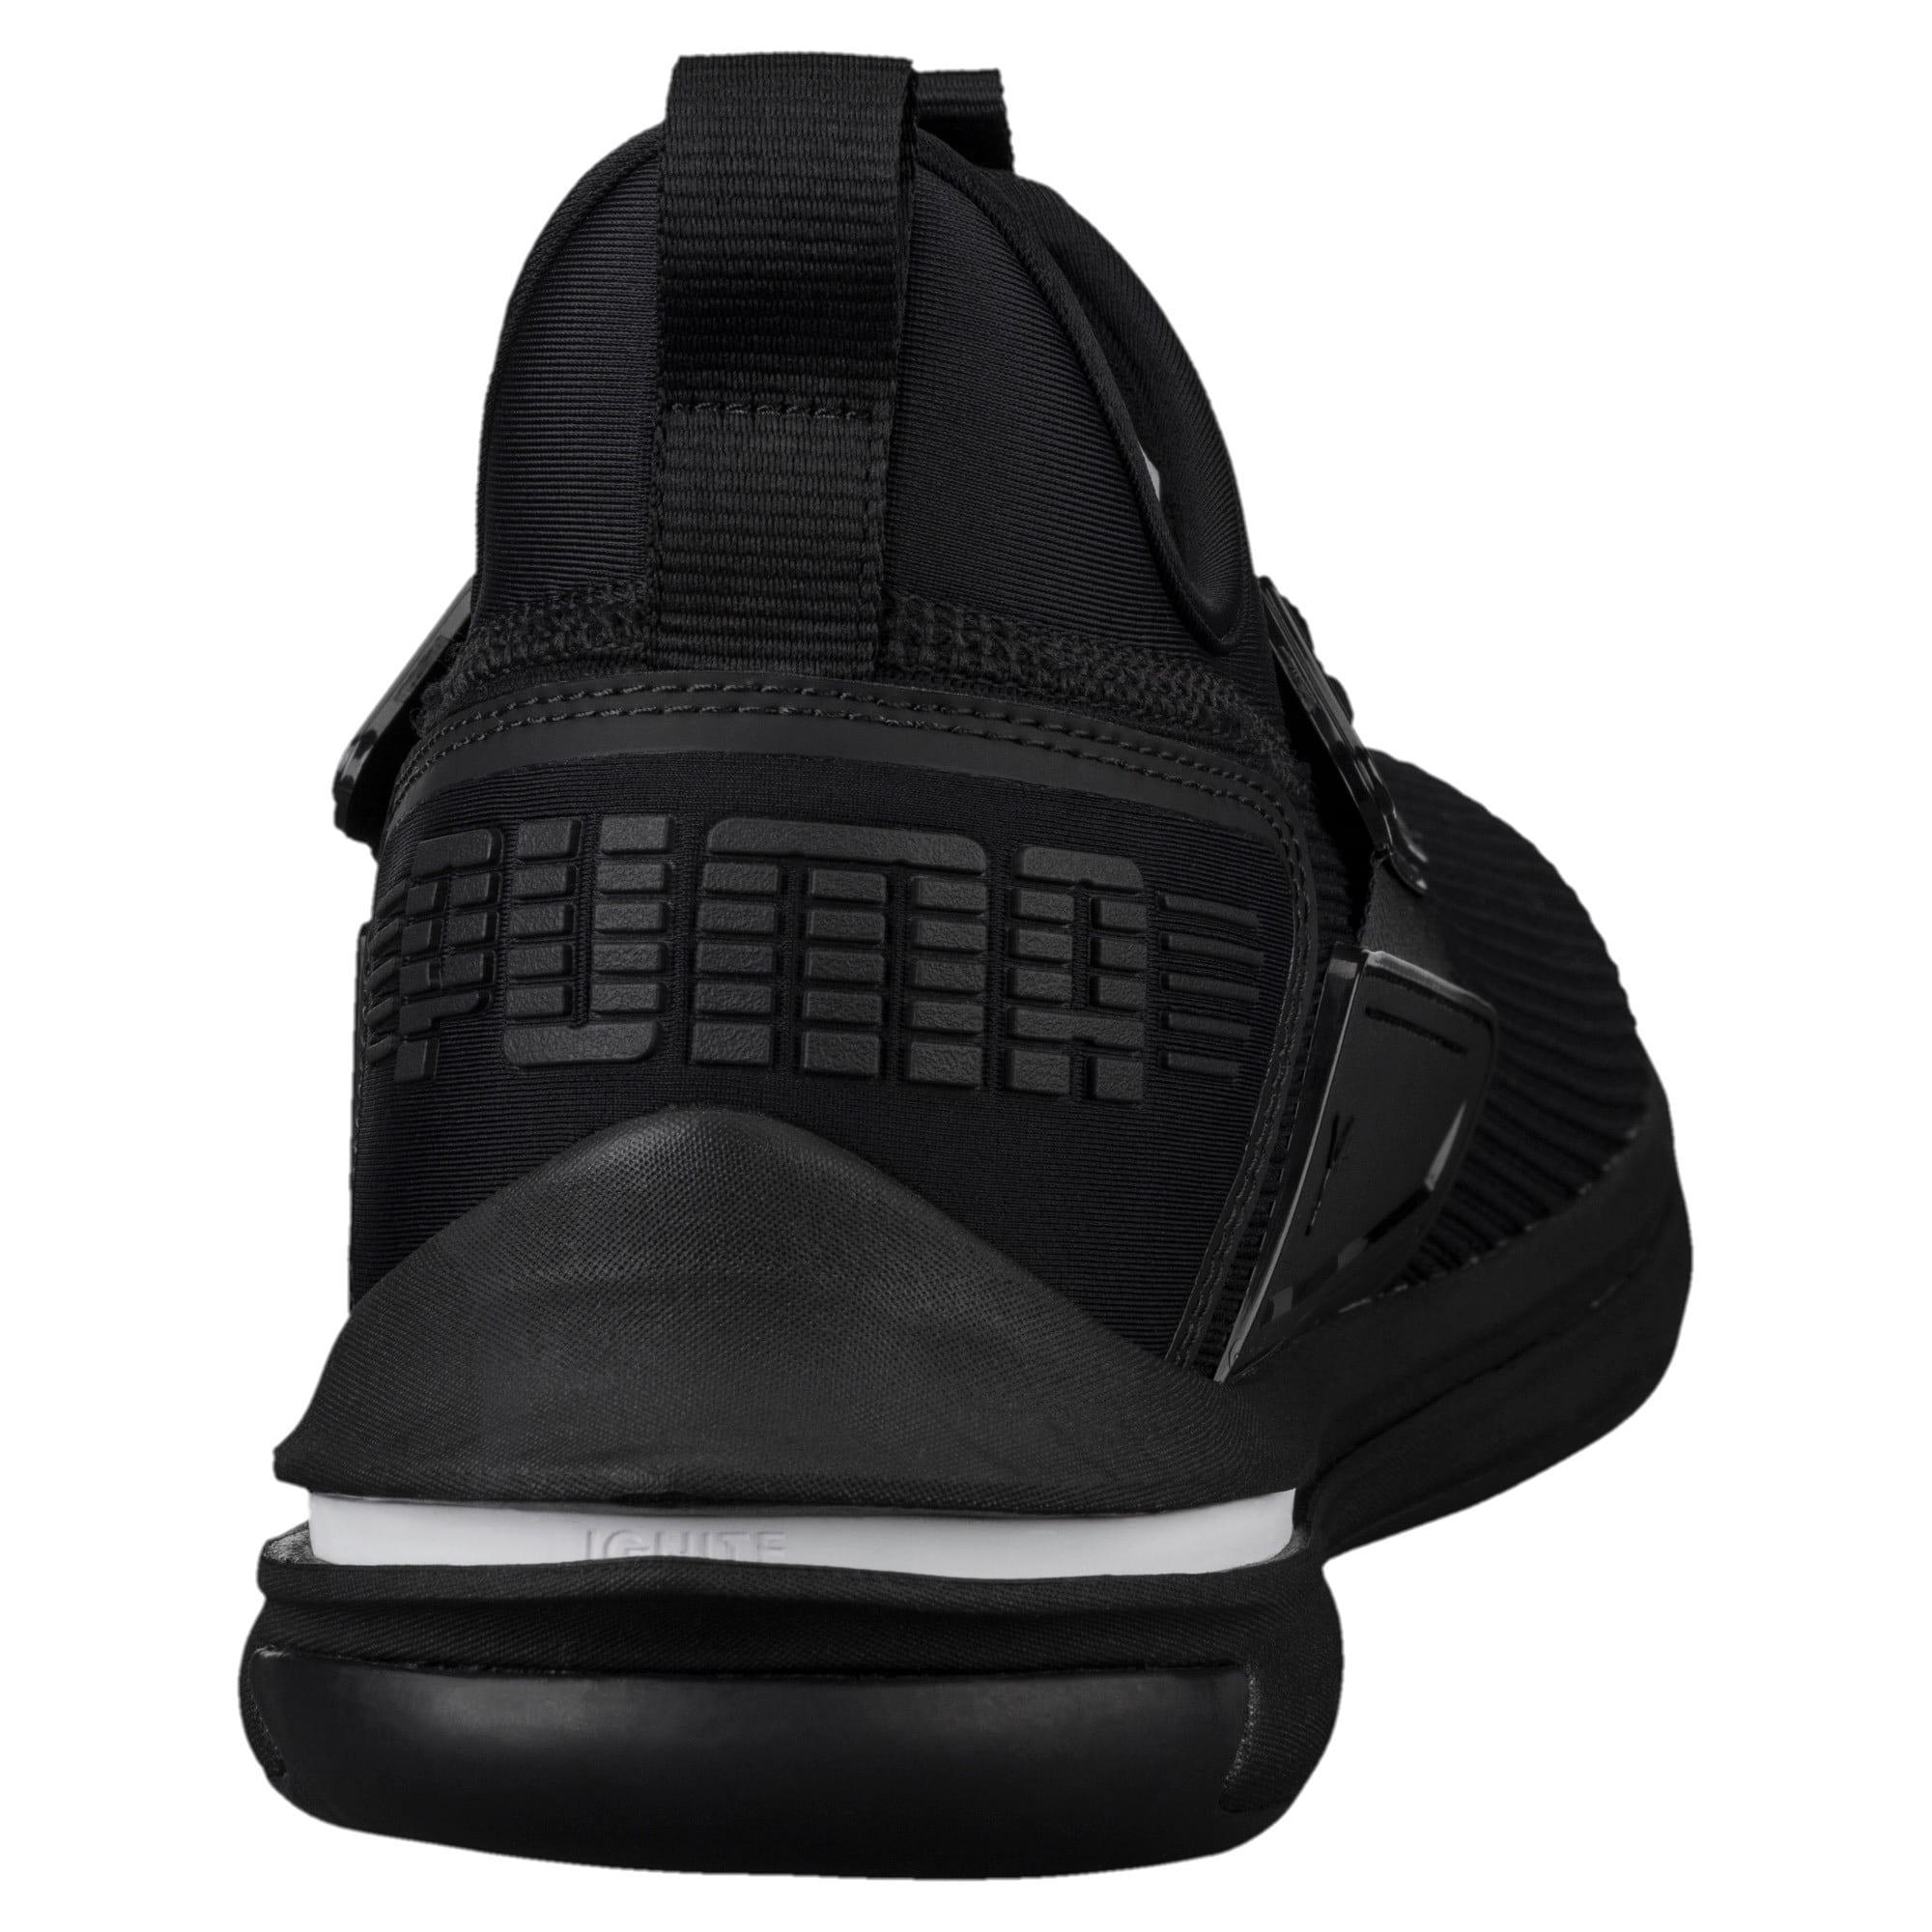 Thumbnail 4 of IGNITE Limitless SR Men's Running Shoes, Puma Black, medium-IND